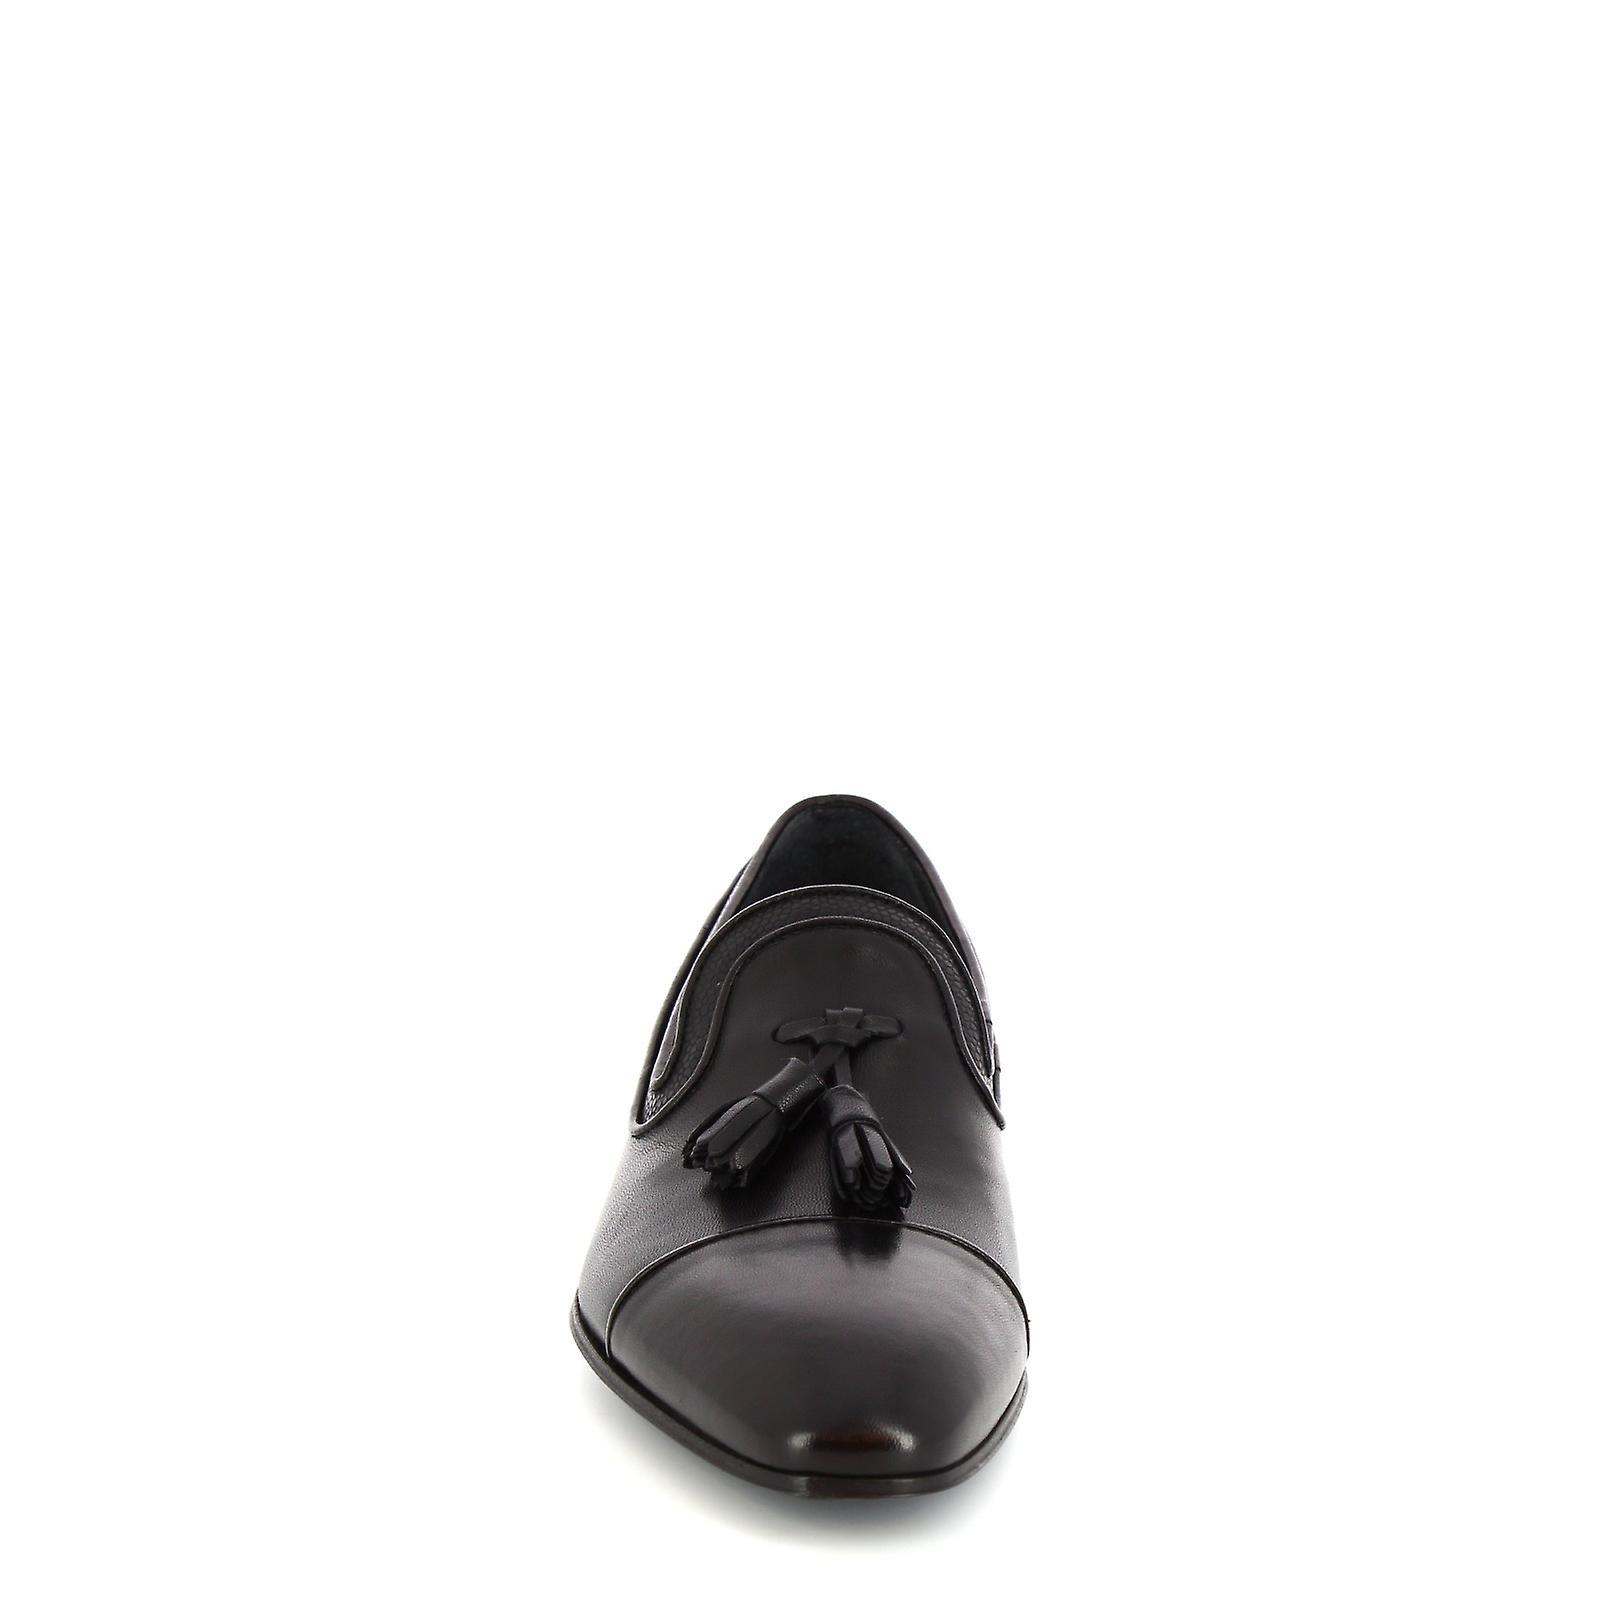 Leonardo Shoes Men's handmade classy tassel loafers in black calf leather QxHsfn